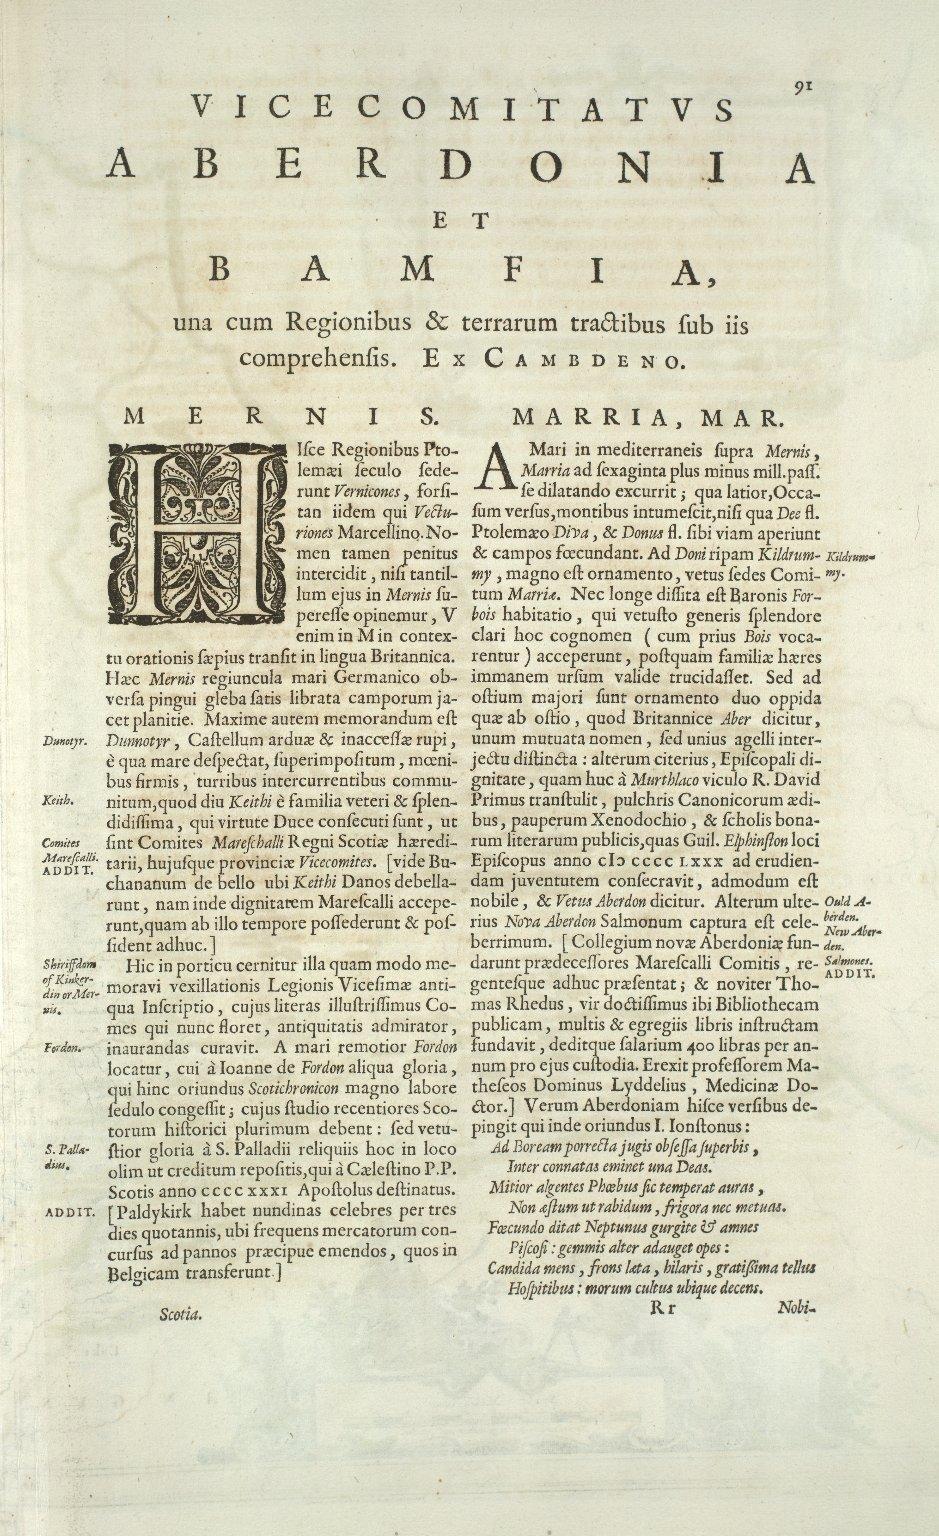 DVO VICECOMITATVS ABERDONIA & BANFIA, Una cum Regionibus & terrarum tractibus sub iis comprehensis. Auctore Roberto Gordonio a Straloch. [1 of 3]